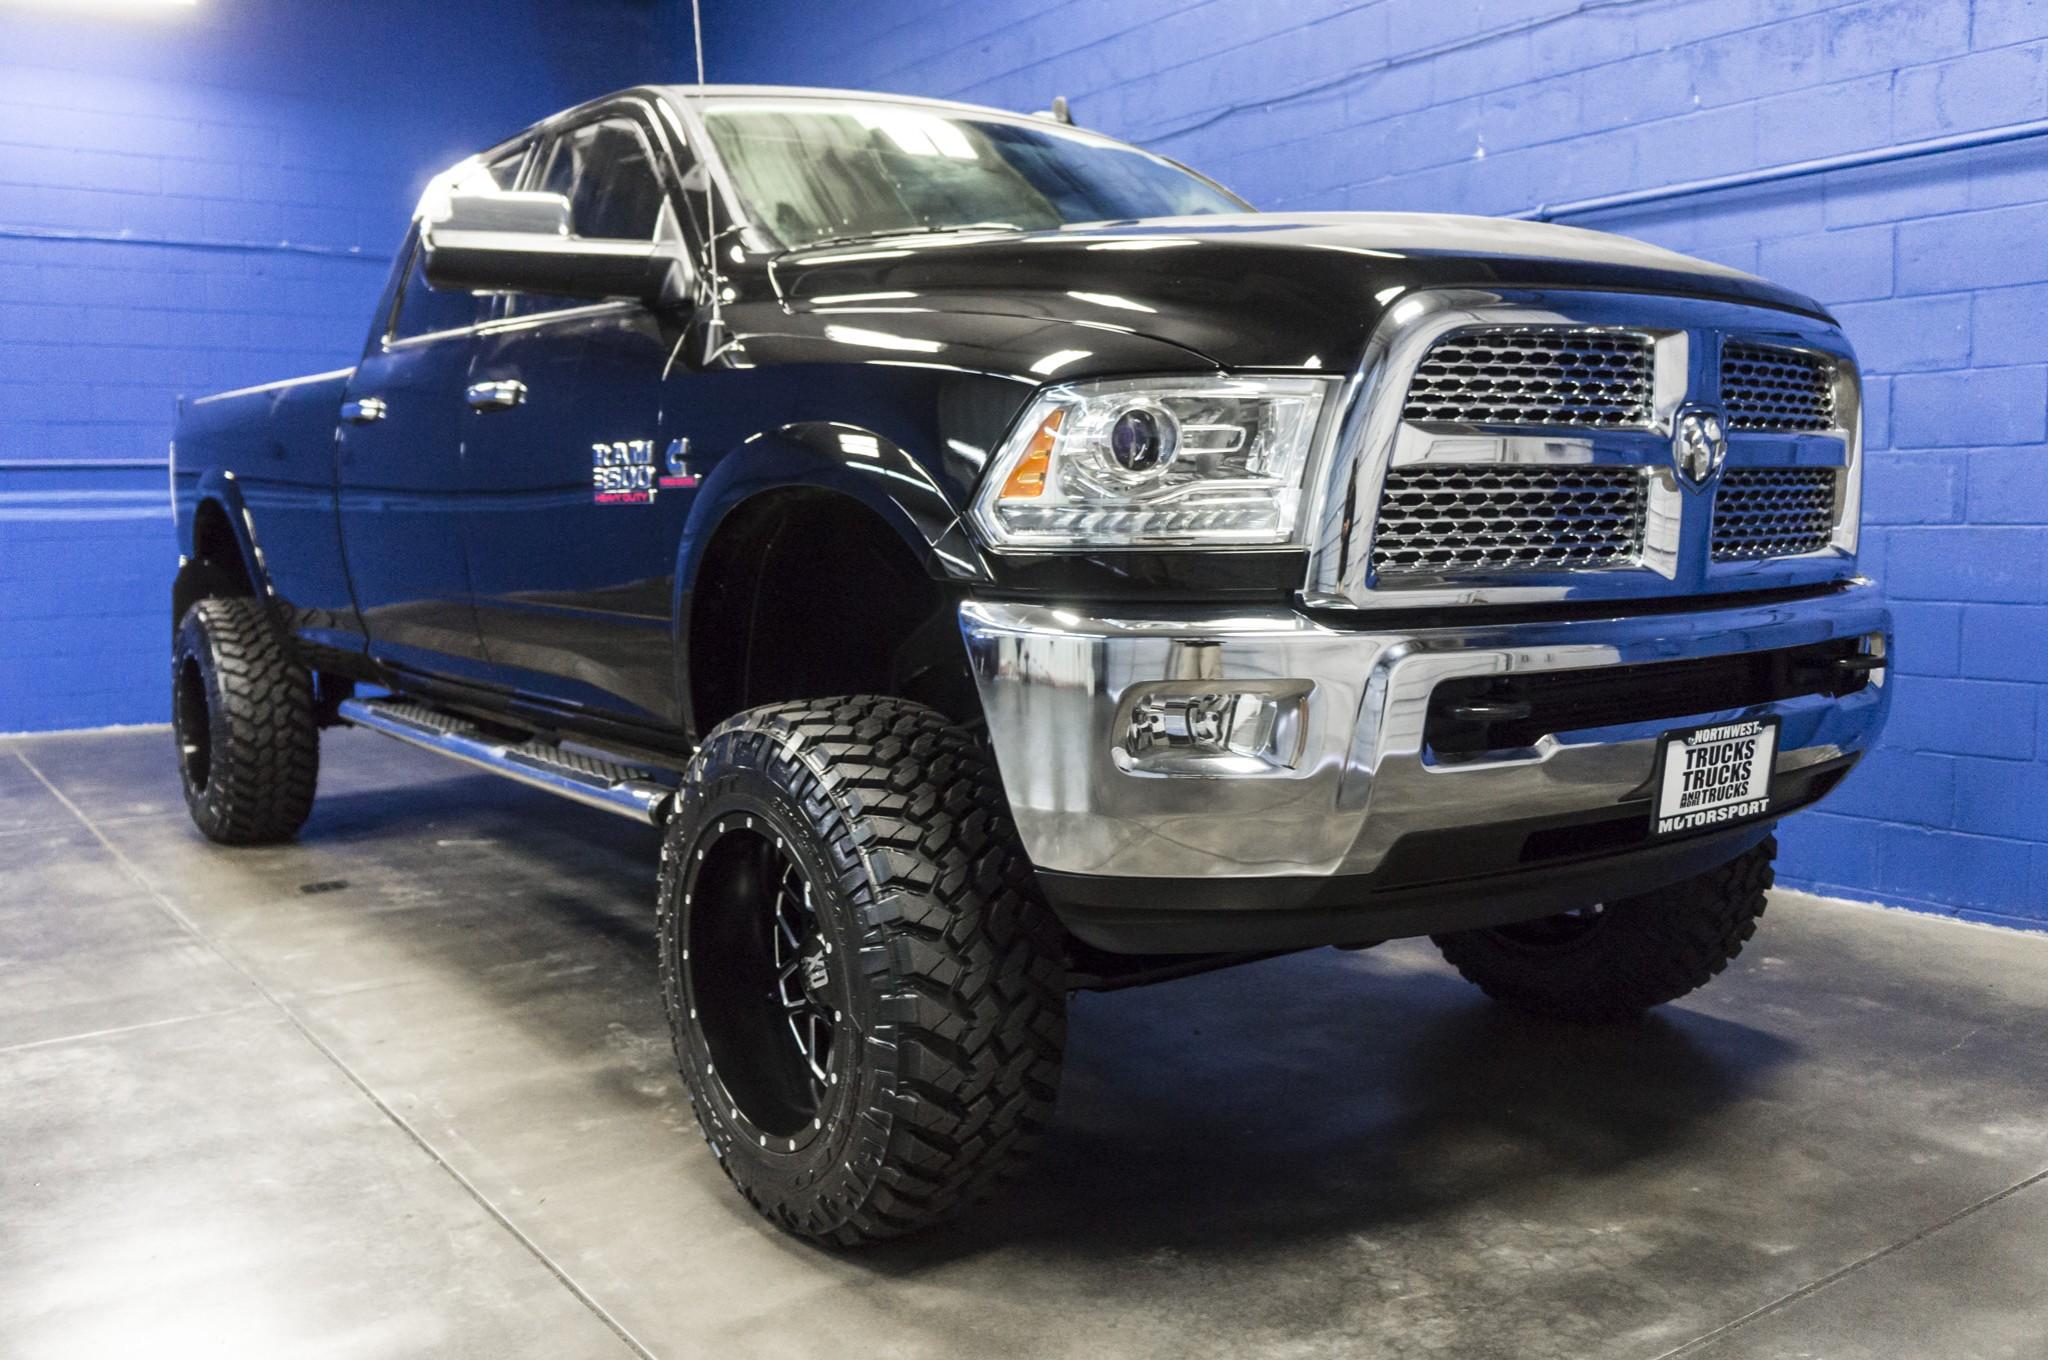 used lifted 2015 dodge ram 3500 laramie 4x4 diesel truck for sale 34910. Black Bedroom Furniture Sets. Home Design Ideas